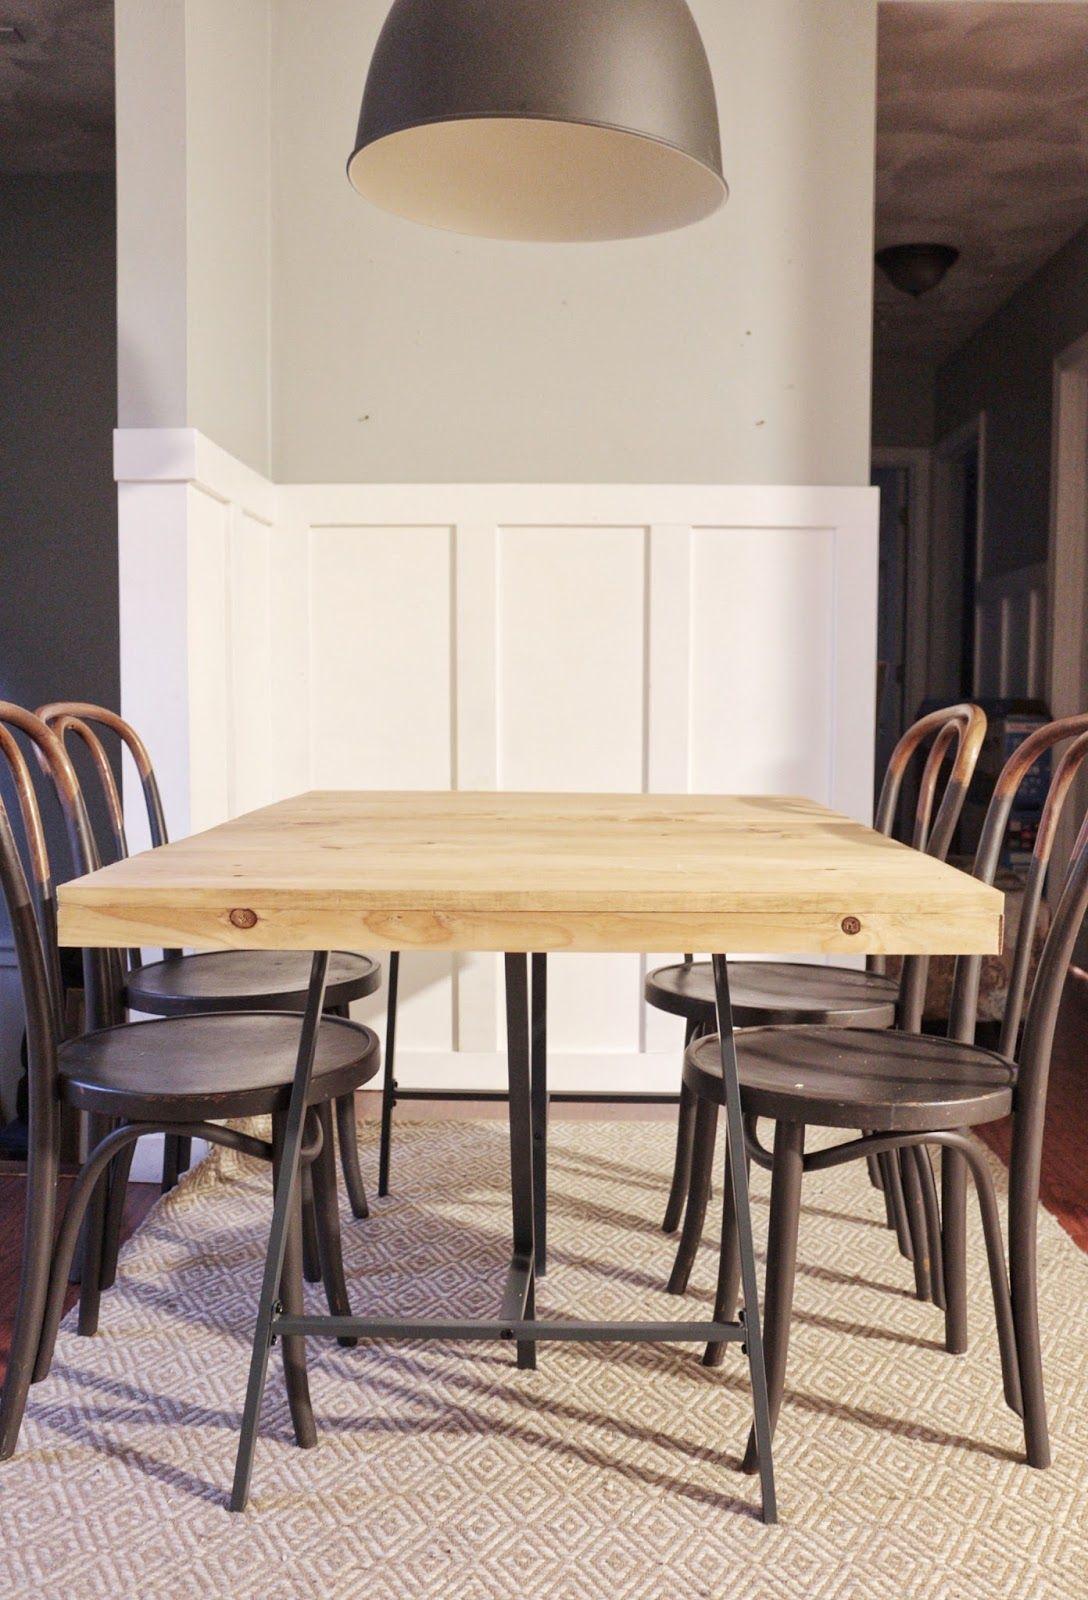 Diy Dining Table Mesa Comedor Ikea Mesas De Comedor Mesas